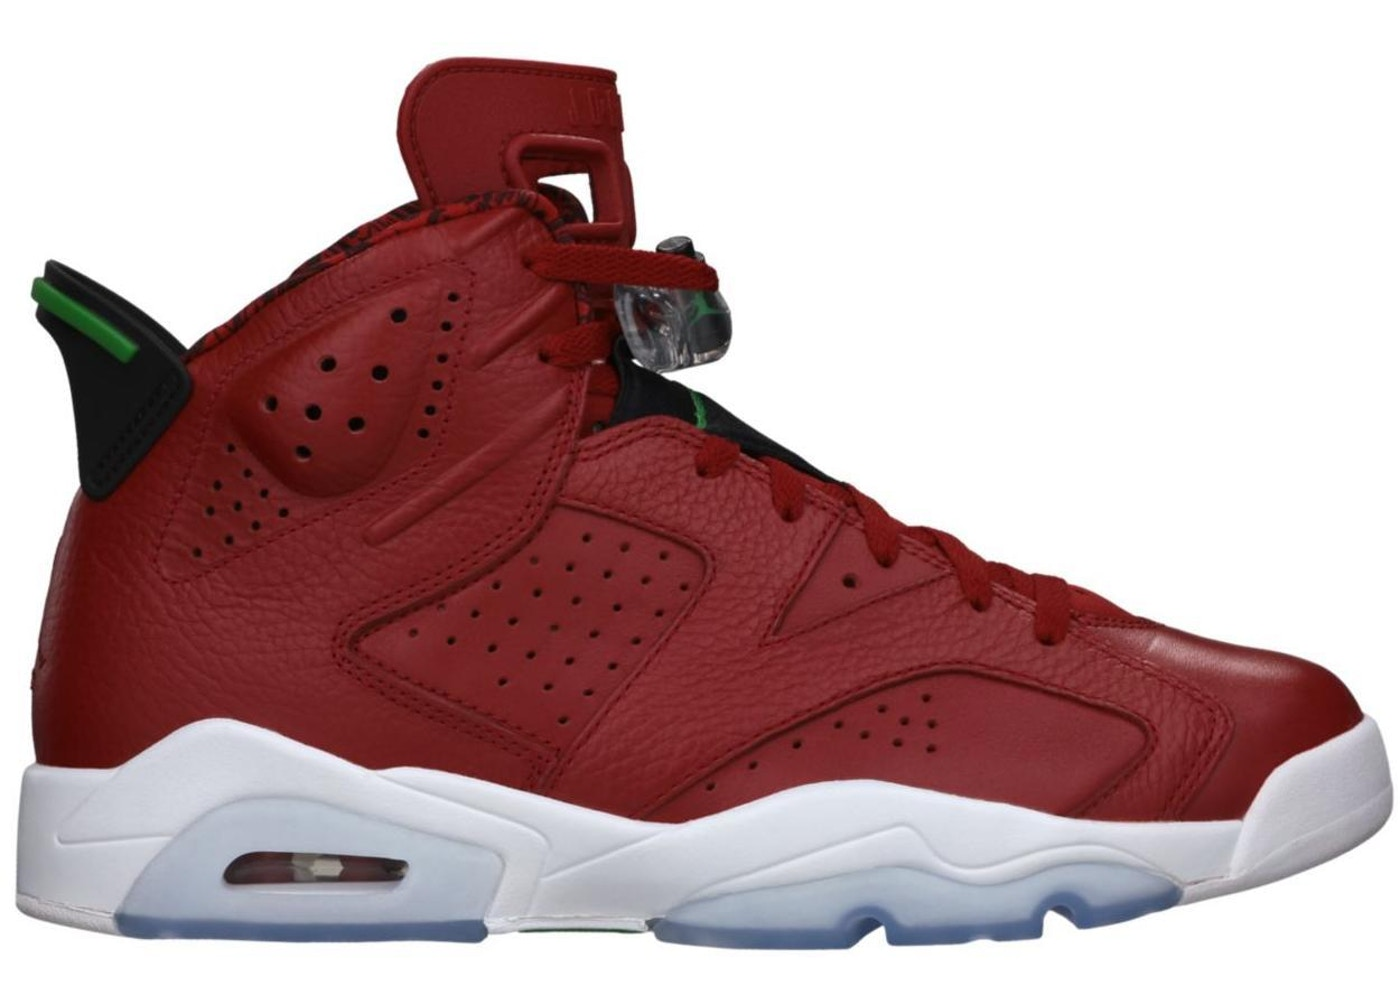 12e6a472e4d565 Buy Air Jordan 6 Shoes   Deadstock Sneakers